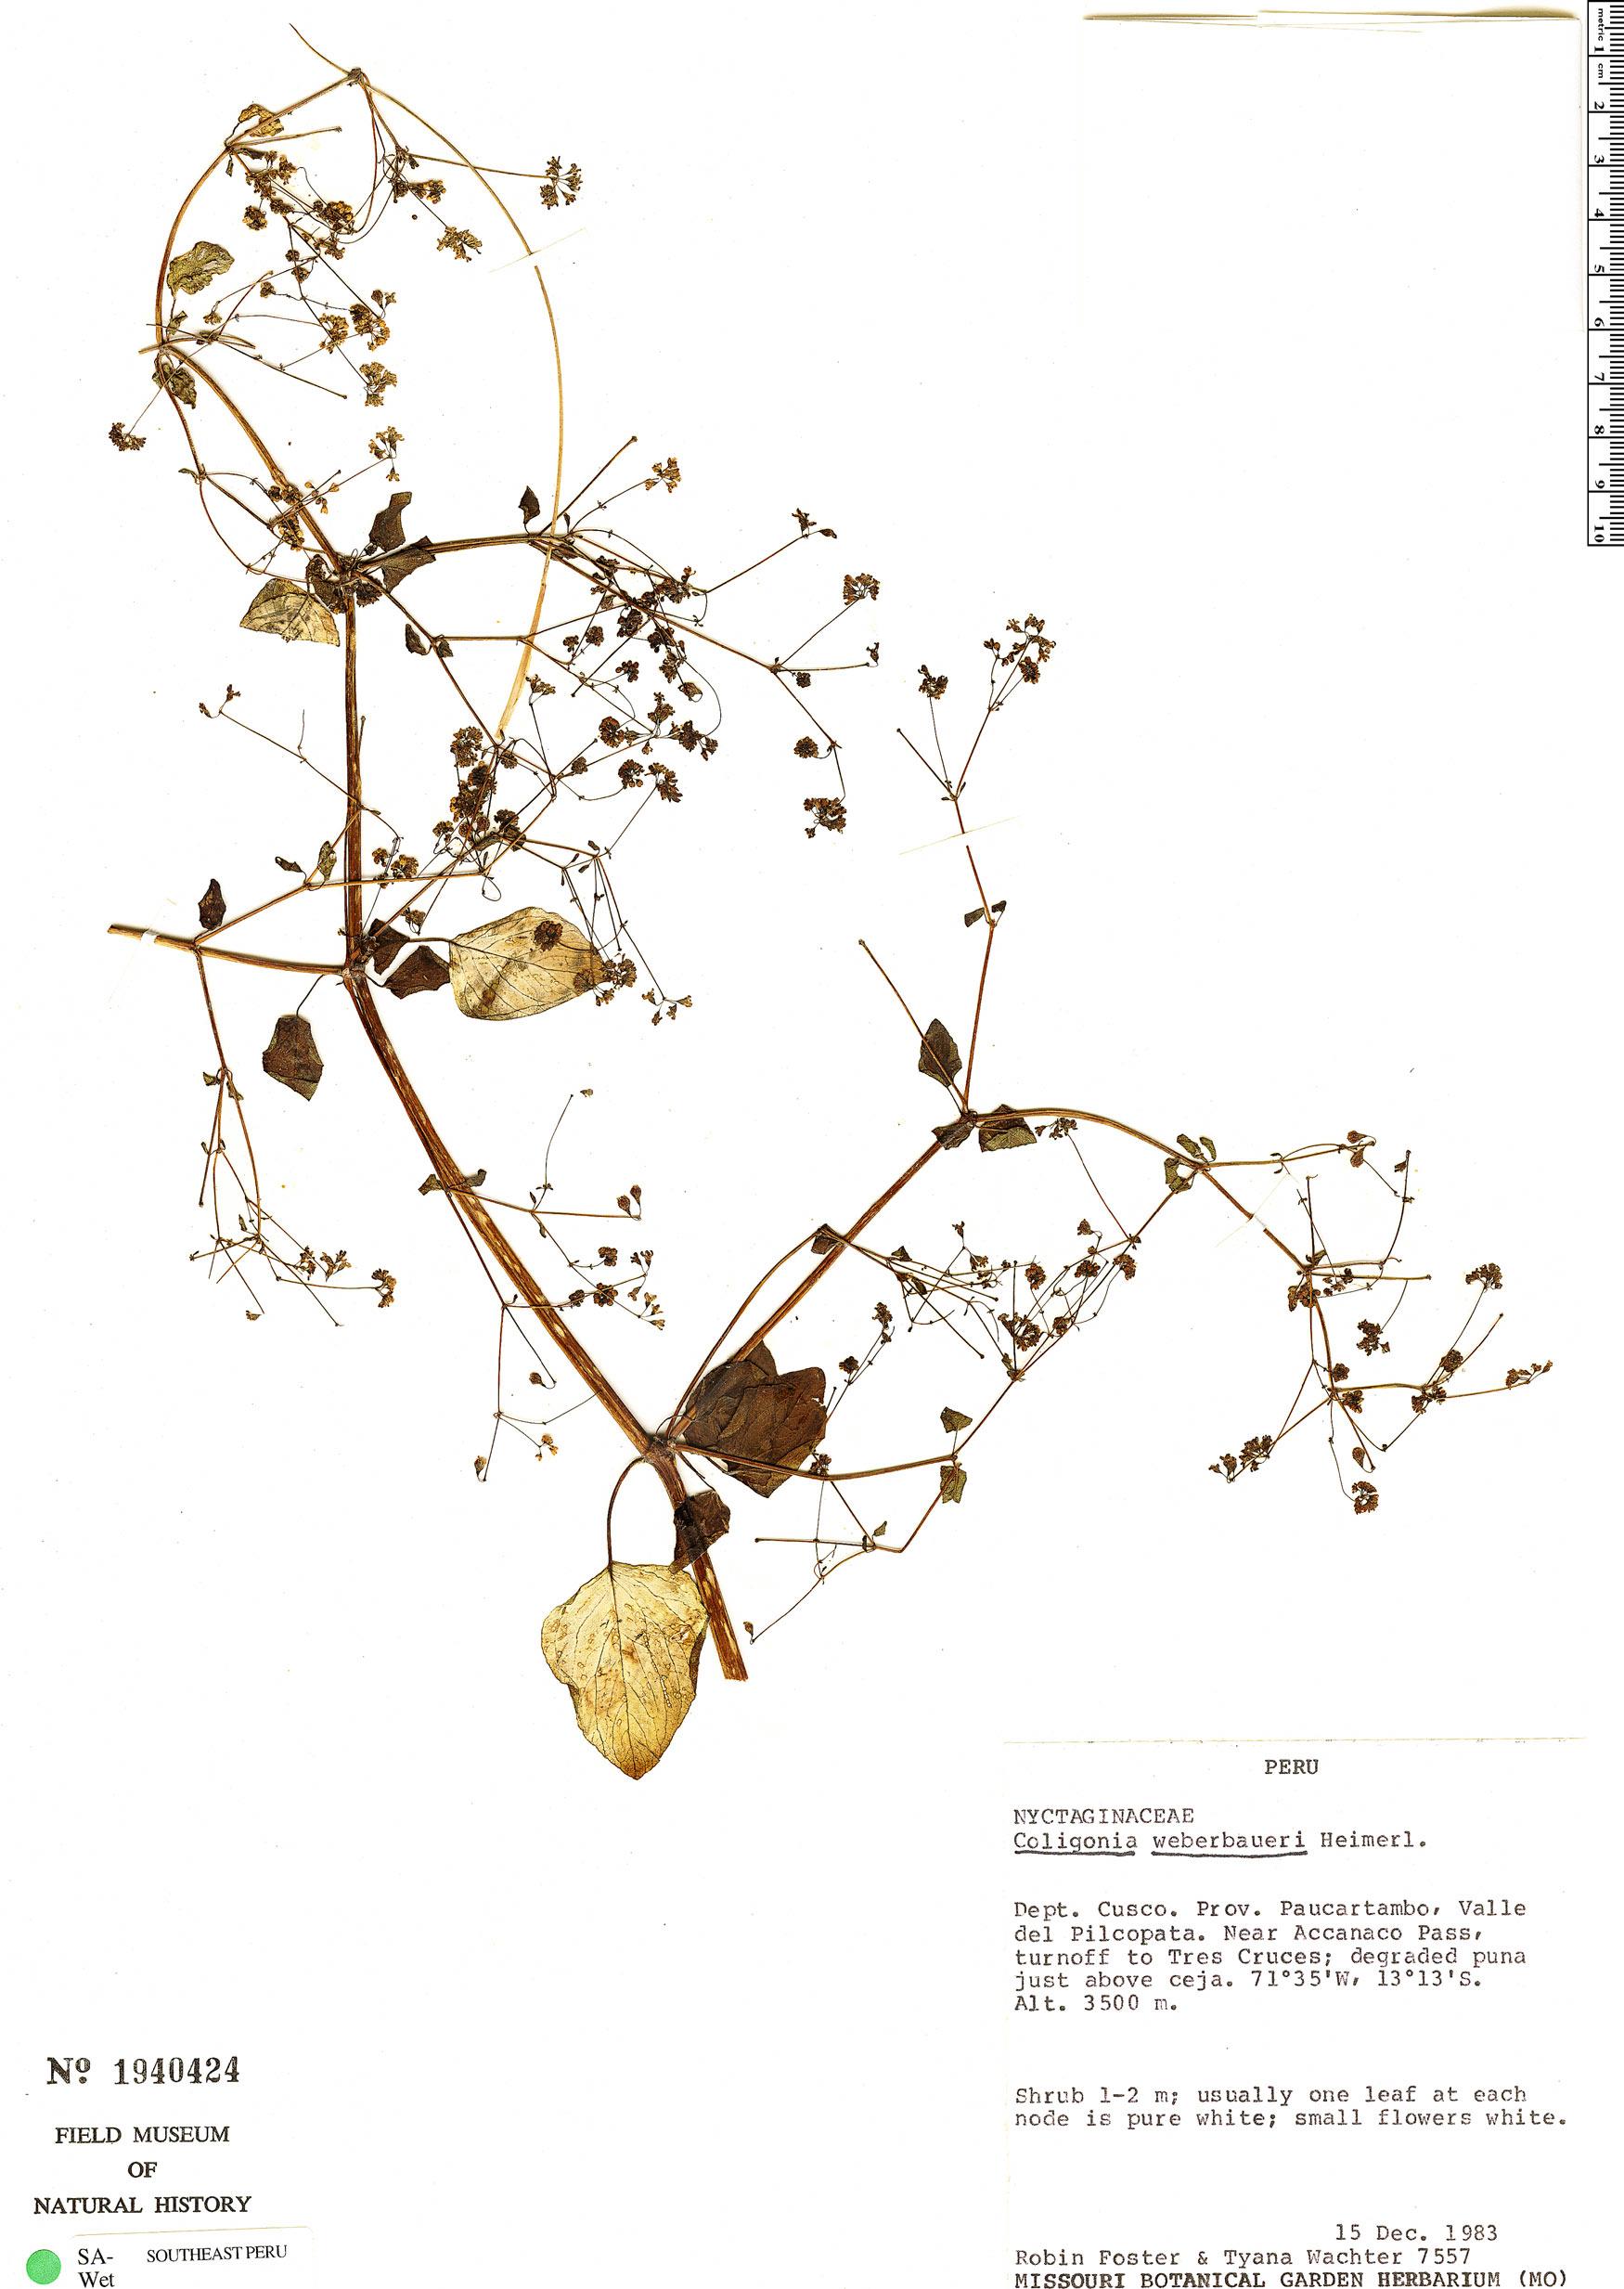 Specimen: Colignonia parviflora